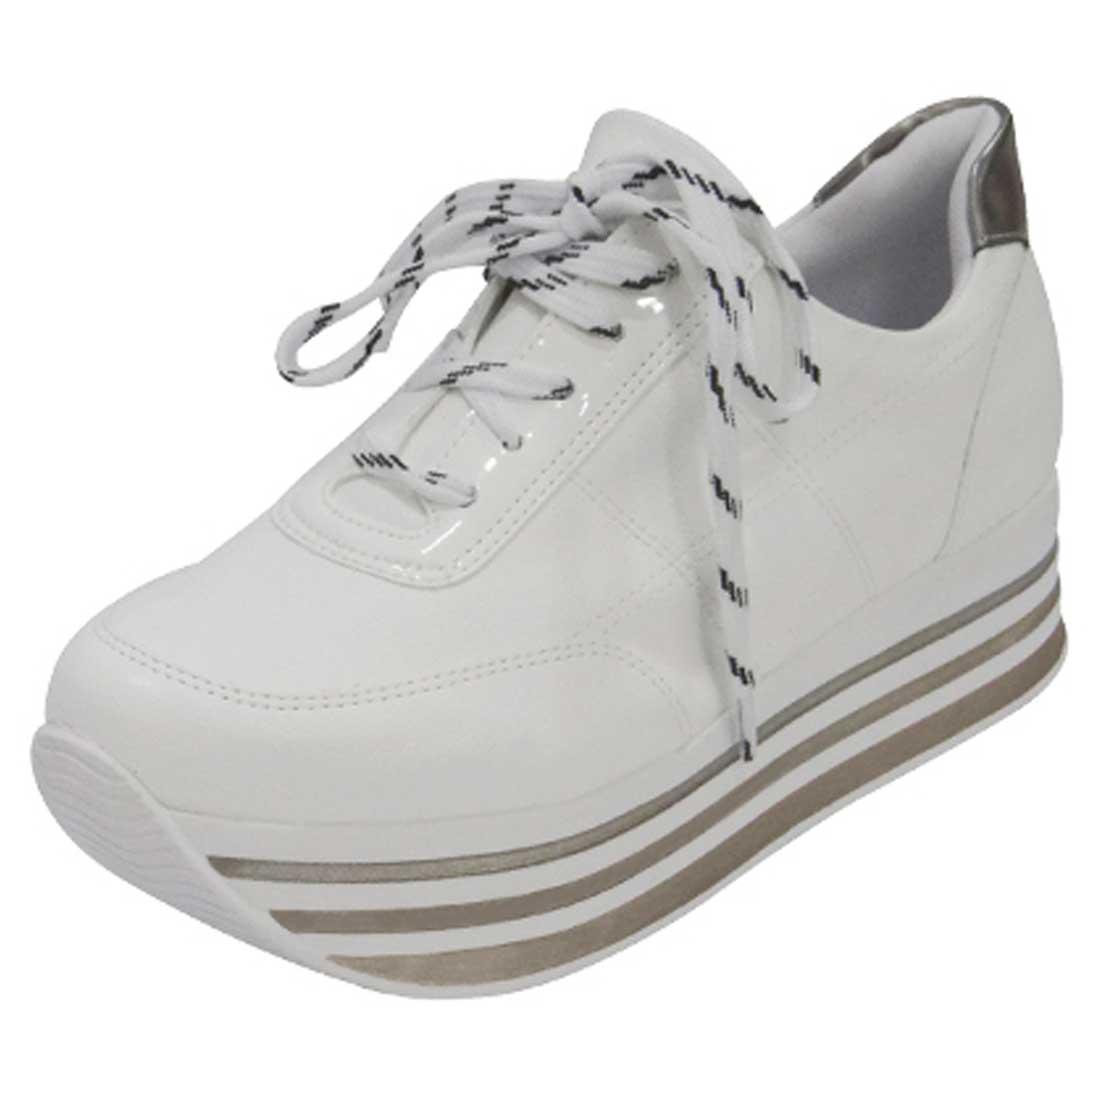 Tênis Flatform - Branco e Prata